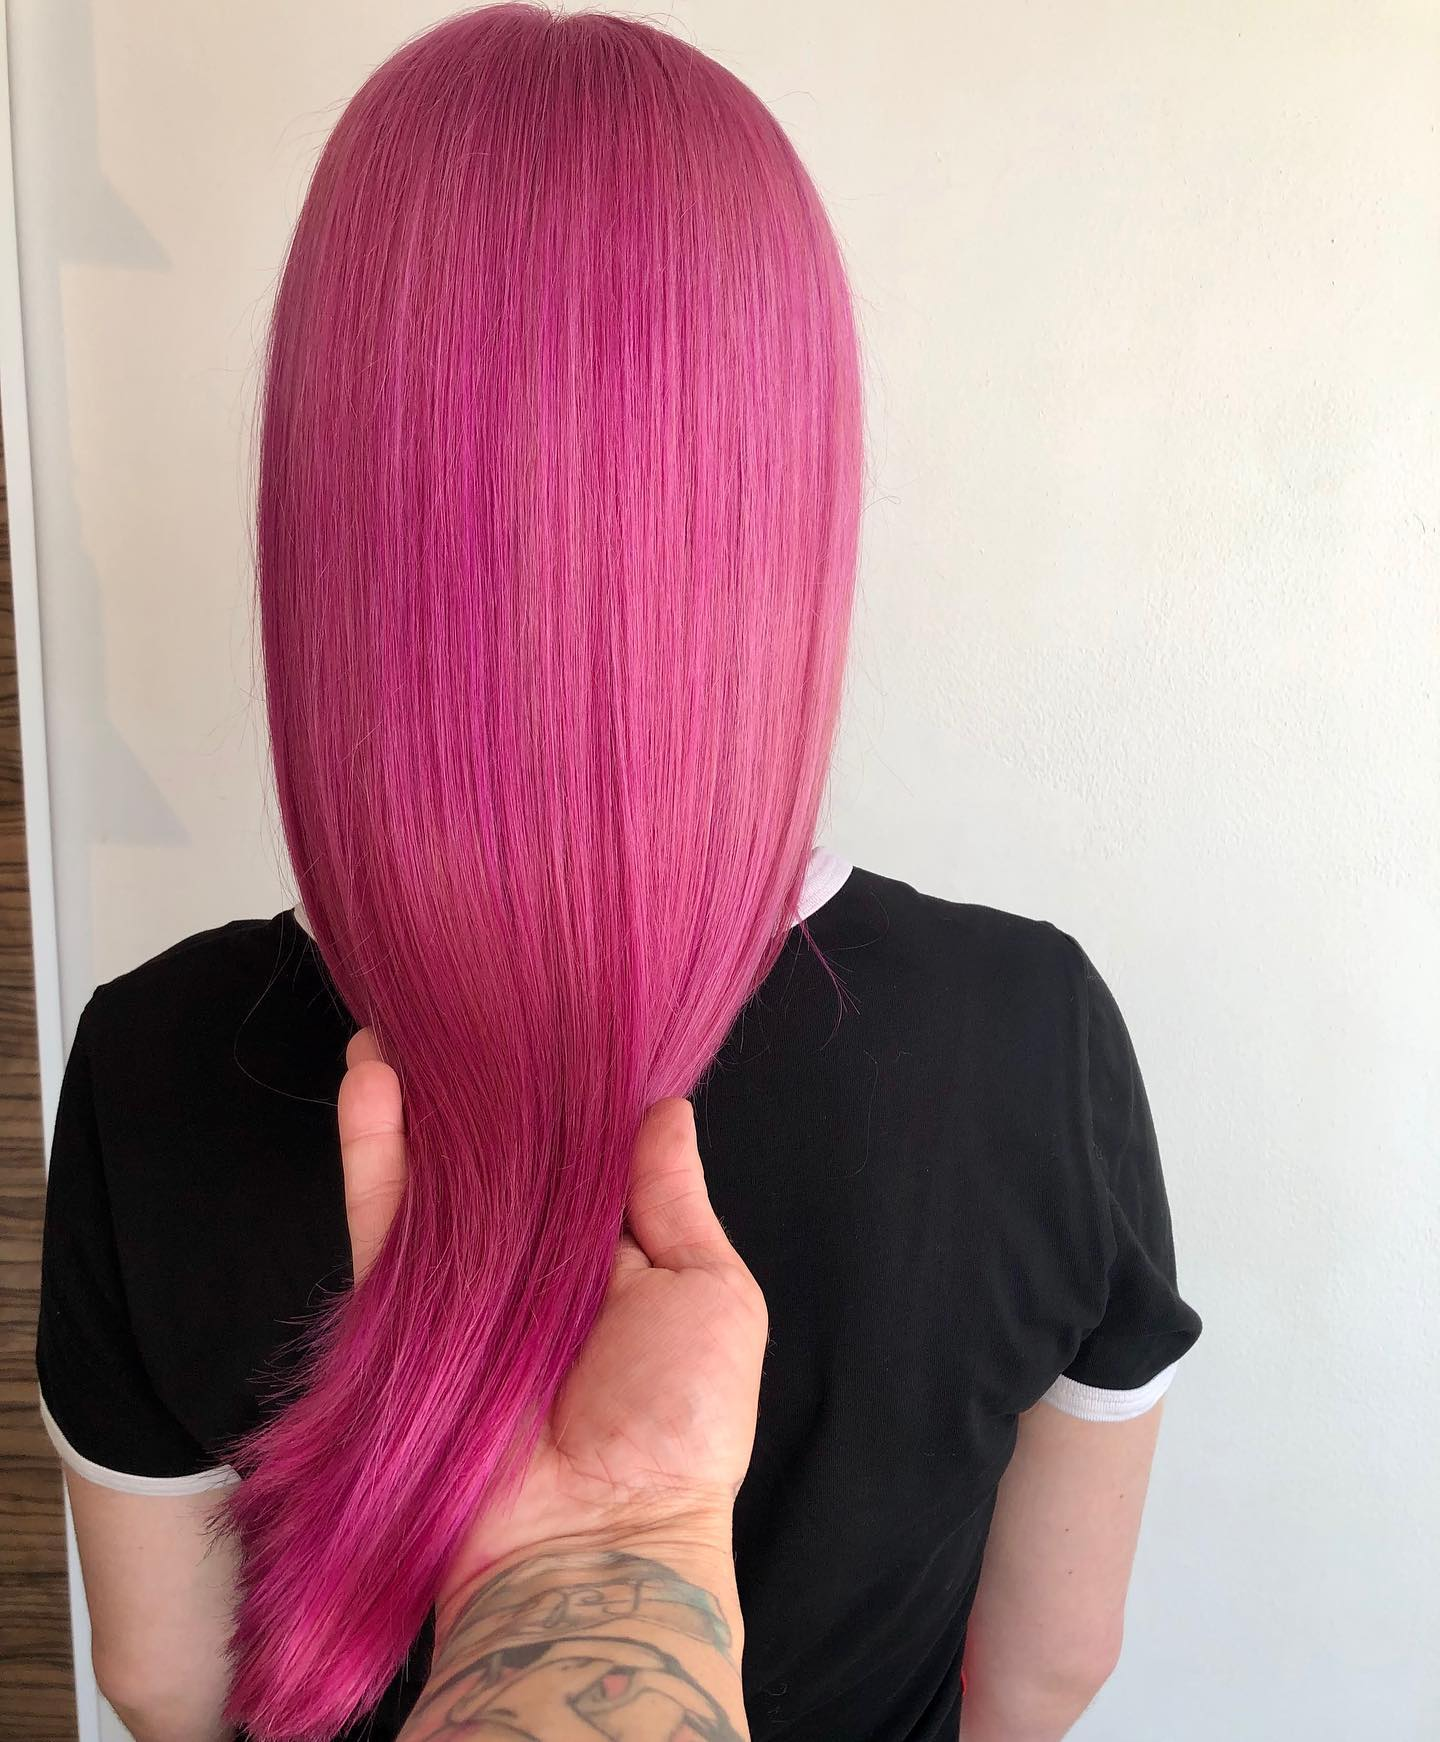 Bright fuchsia pink hair colour displayed on a salon client